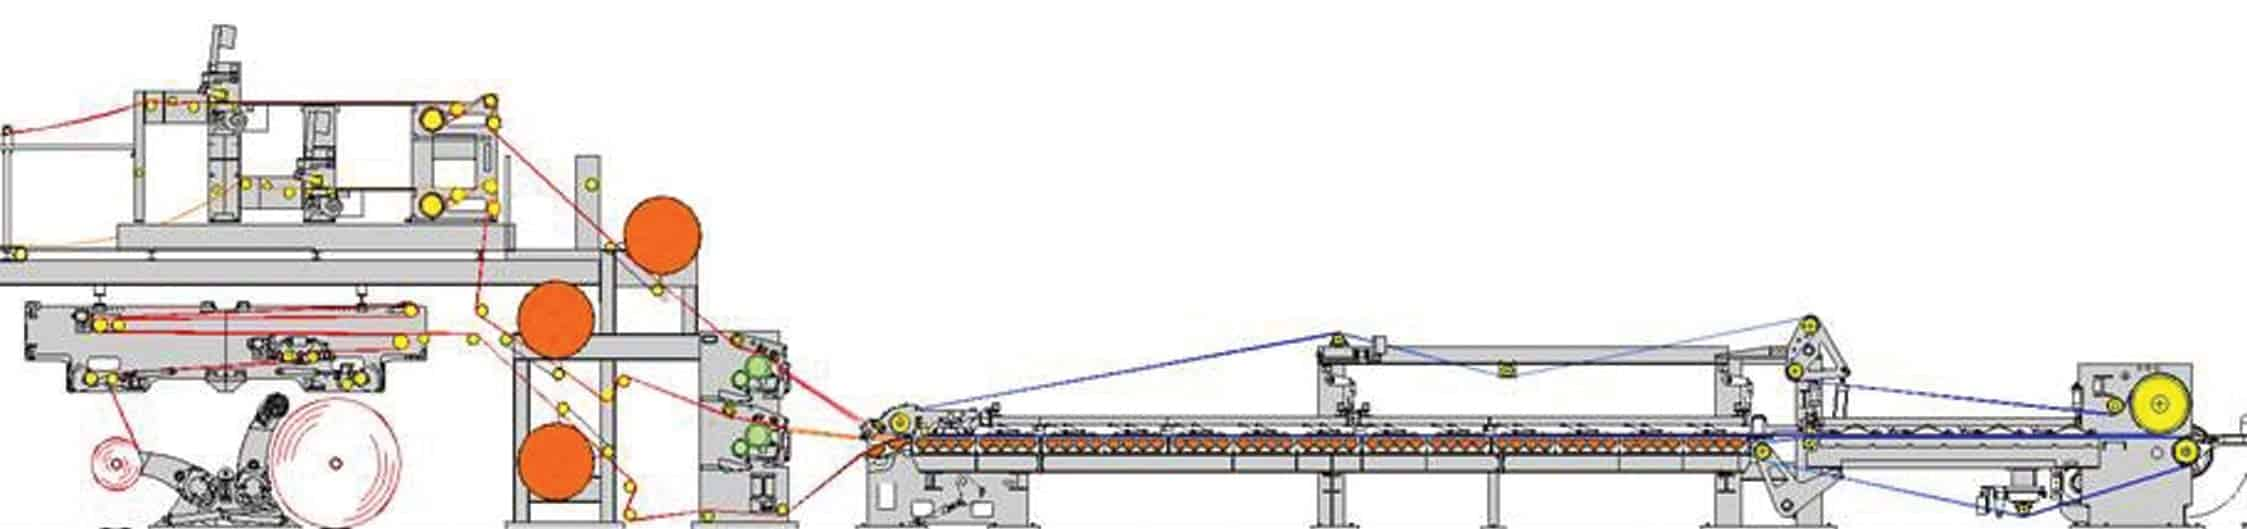 Compact Line Concept